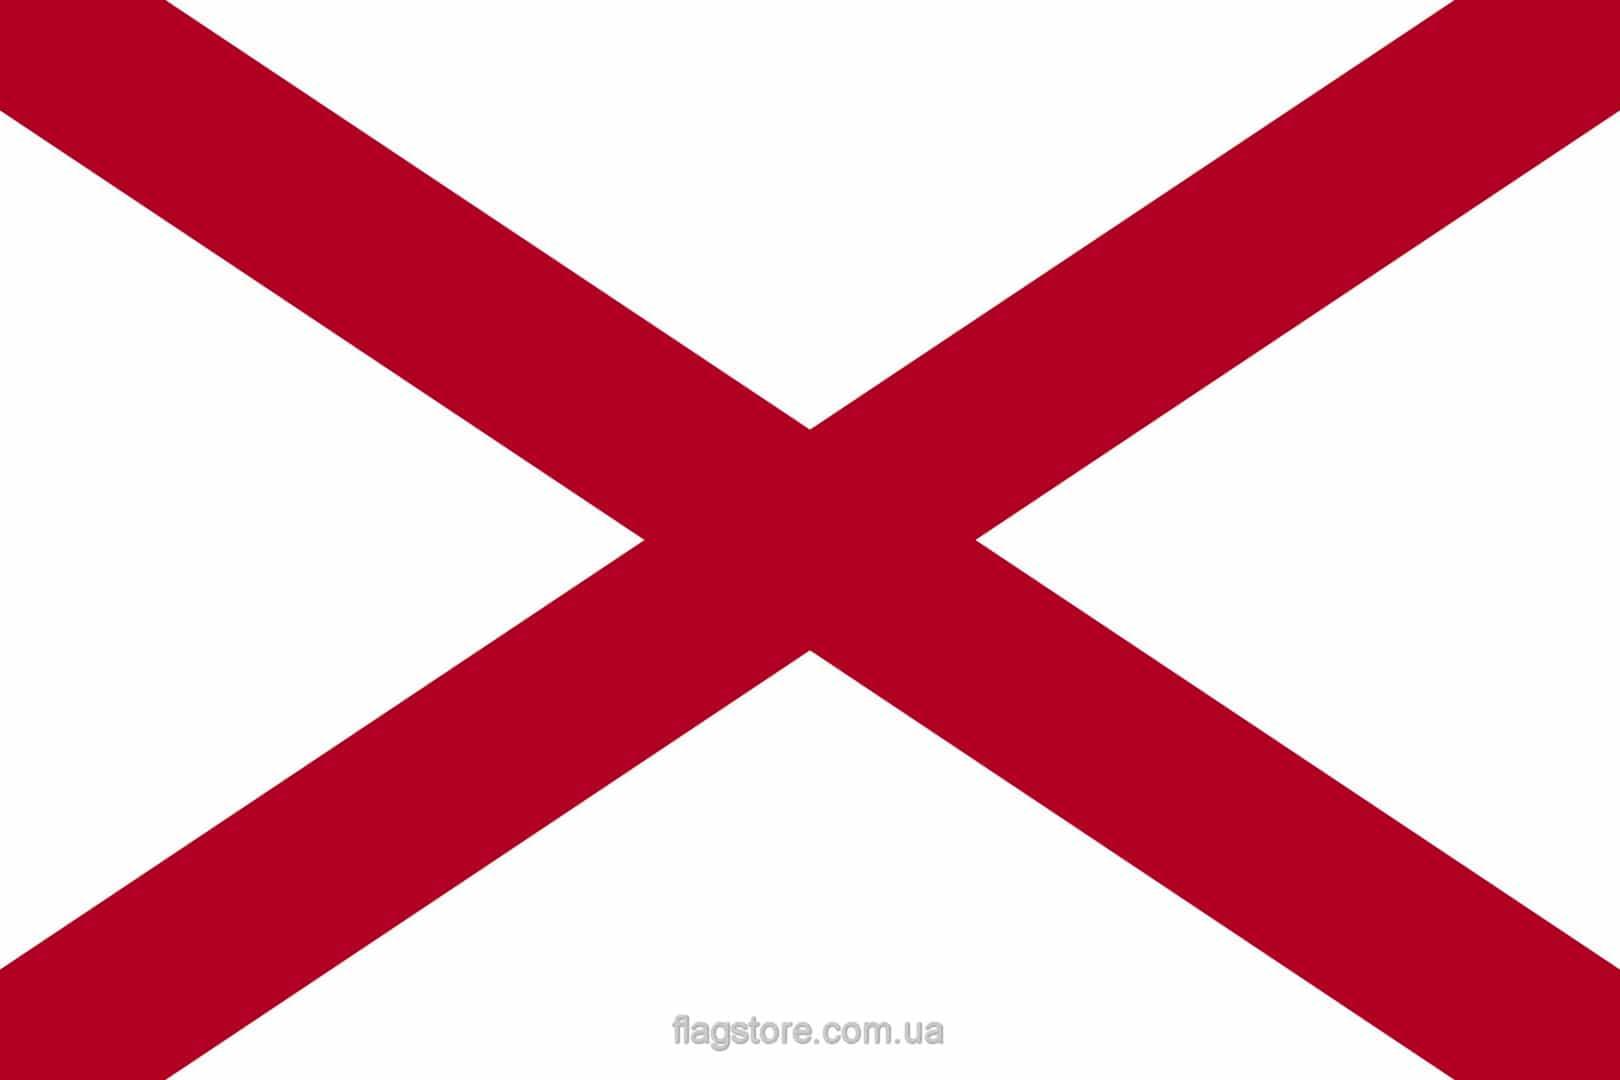 Купить флаг Алабамы (штата Алабама)